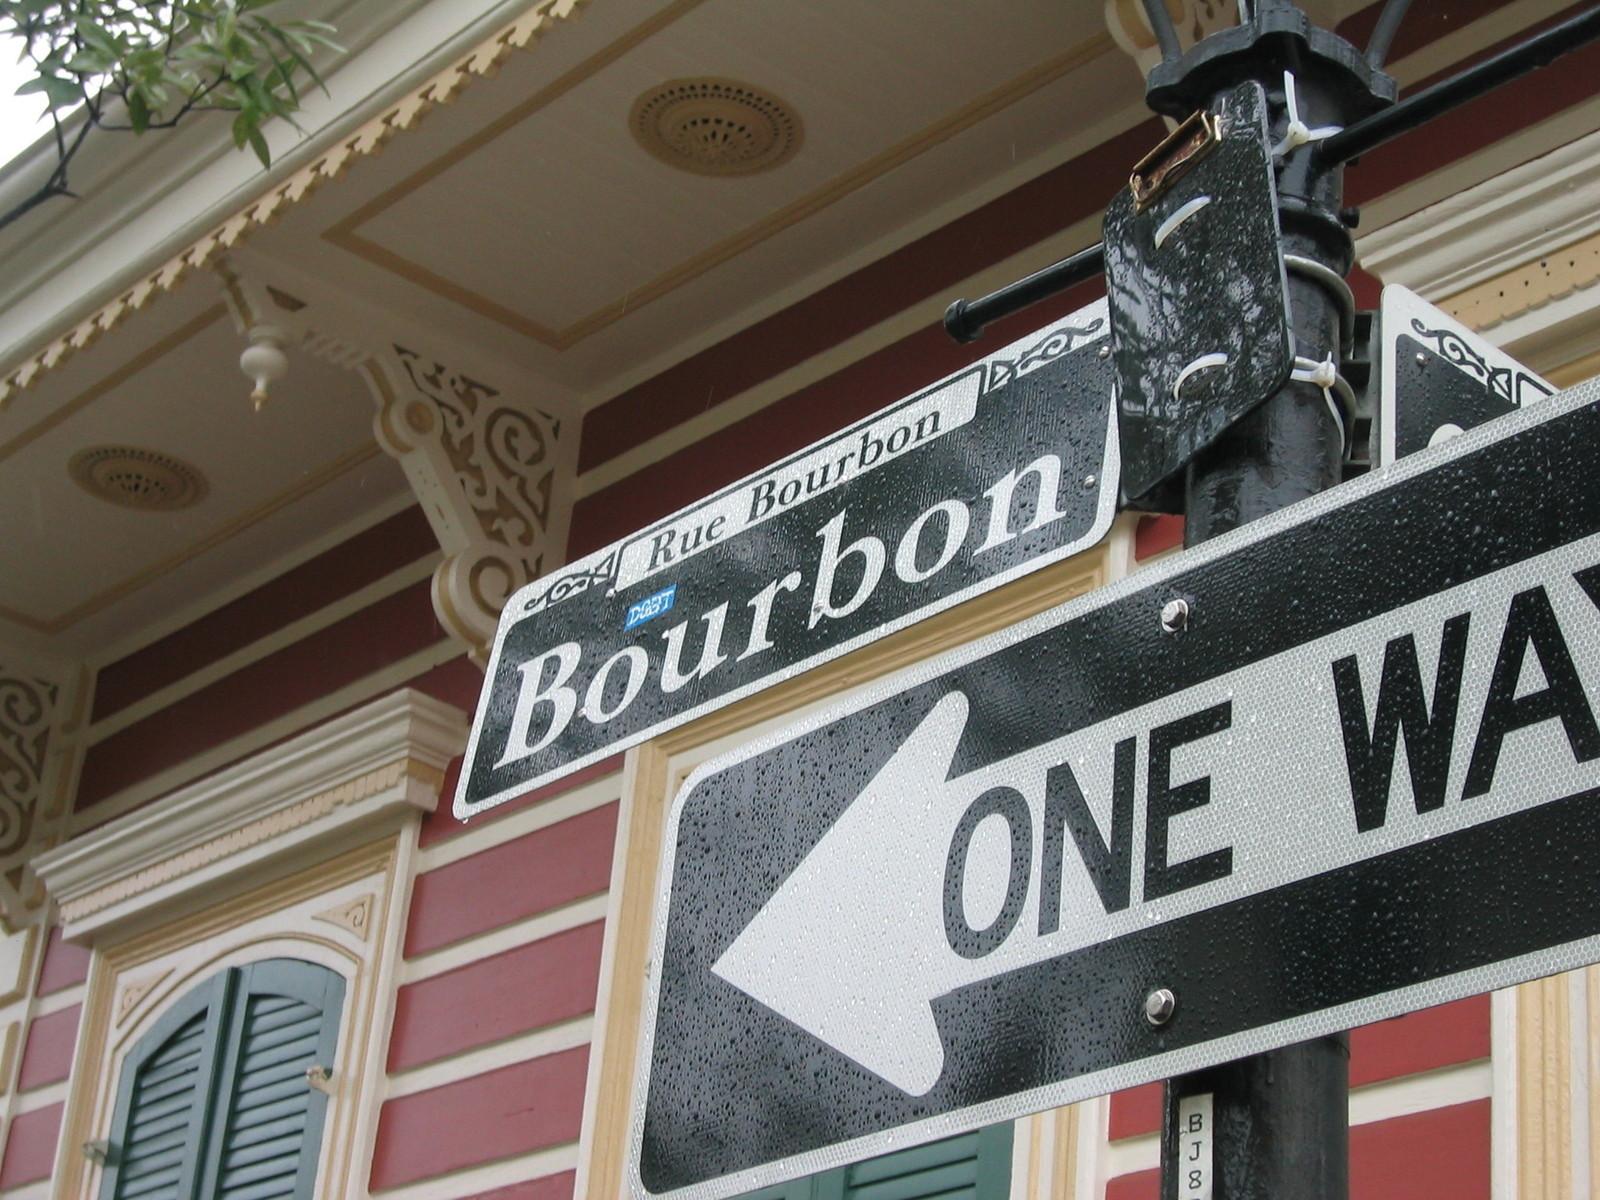 new orleans, bourbon street, gumbo, water testing, dna analysis